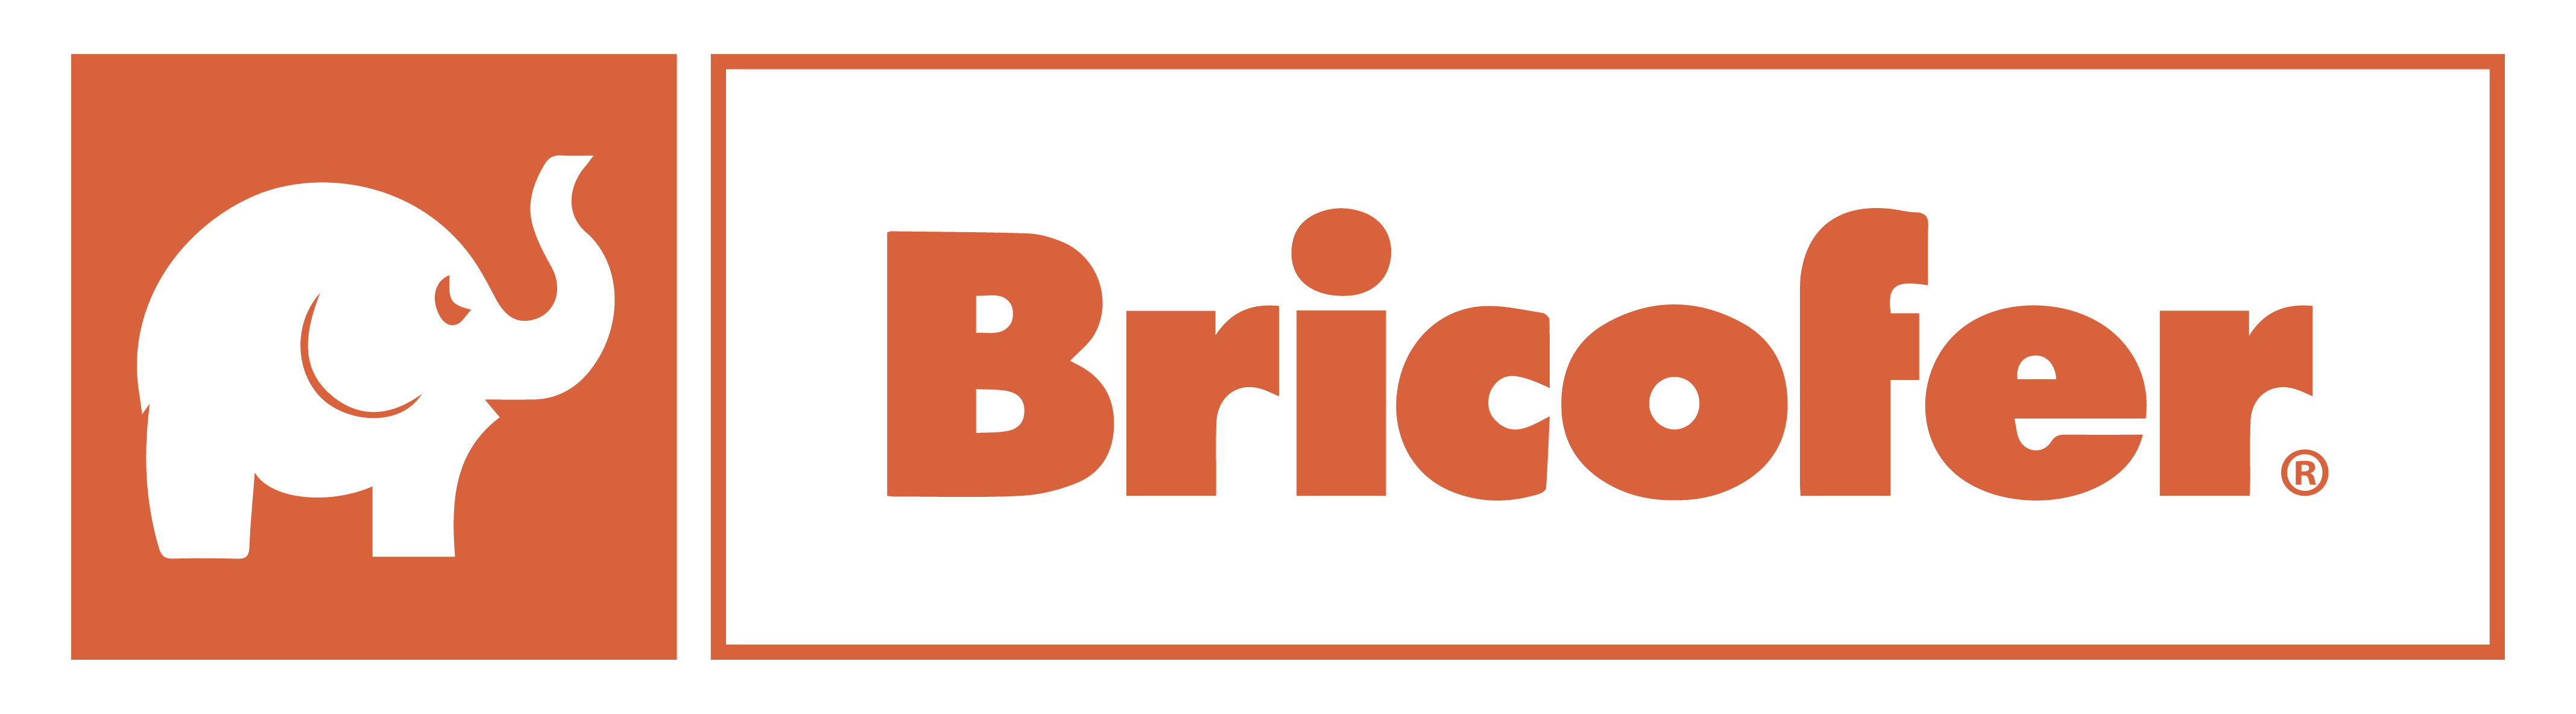 Customer Microlog Retail Bricofer